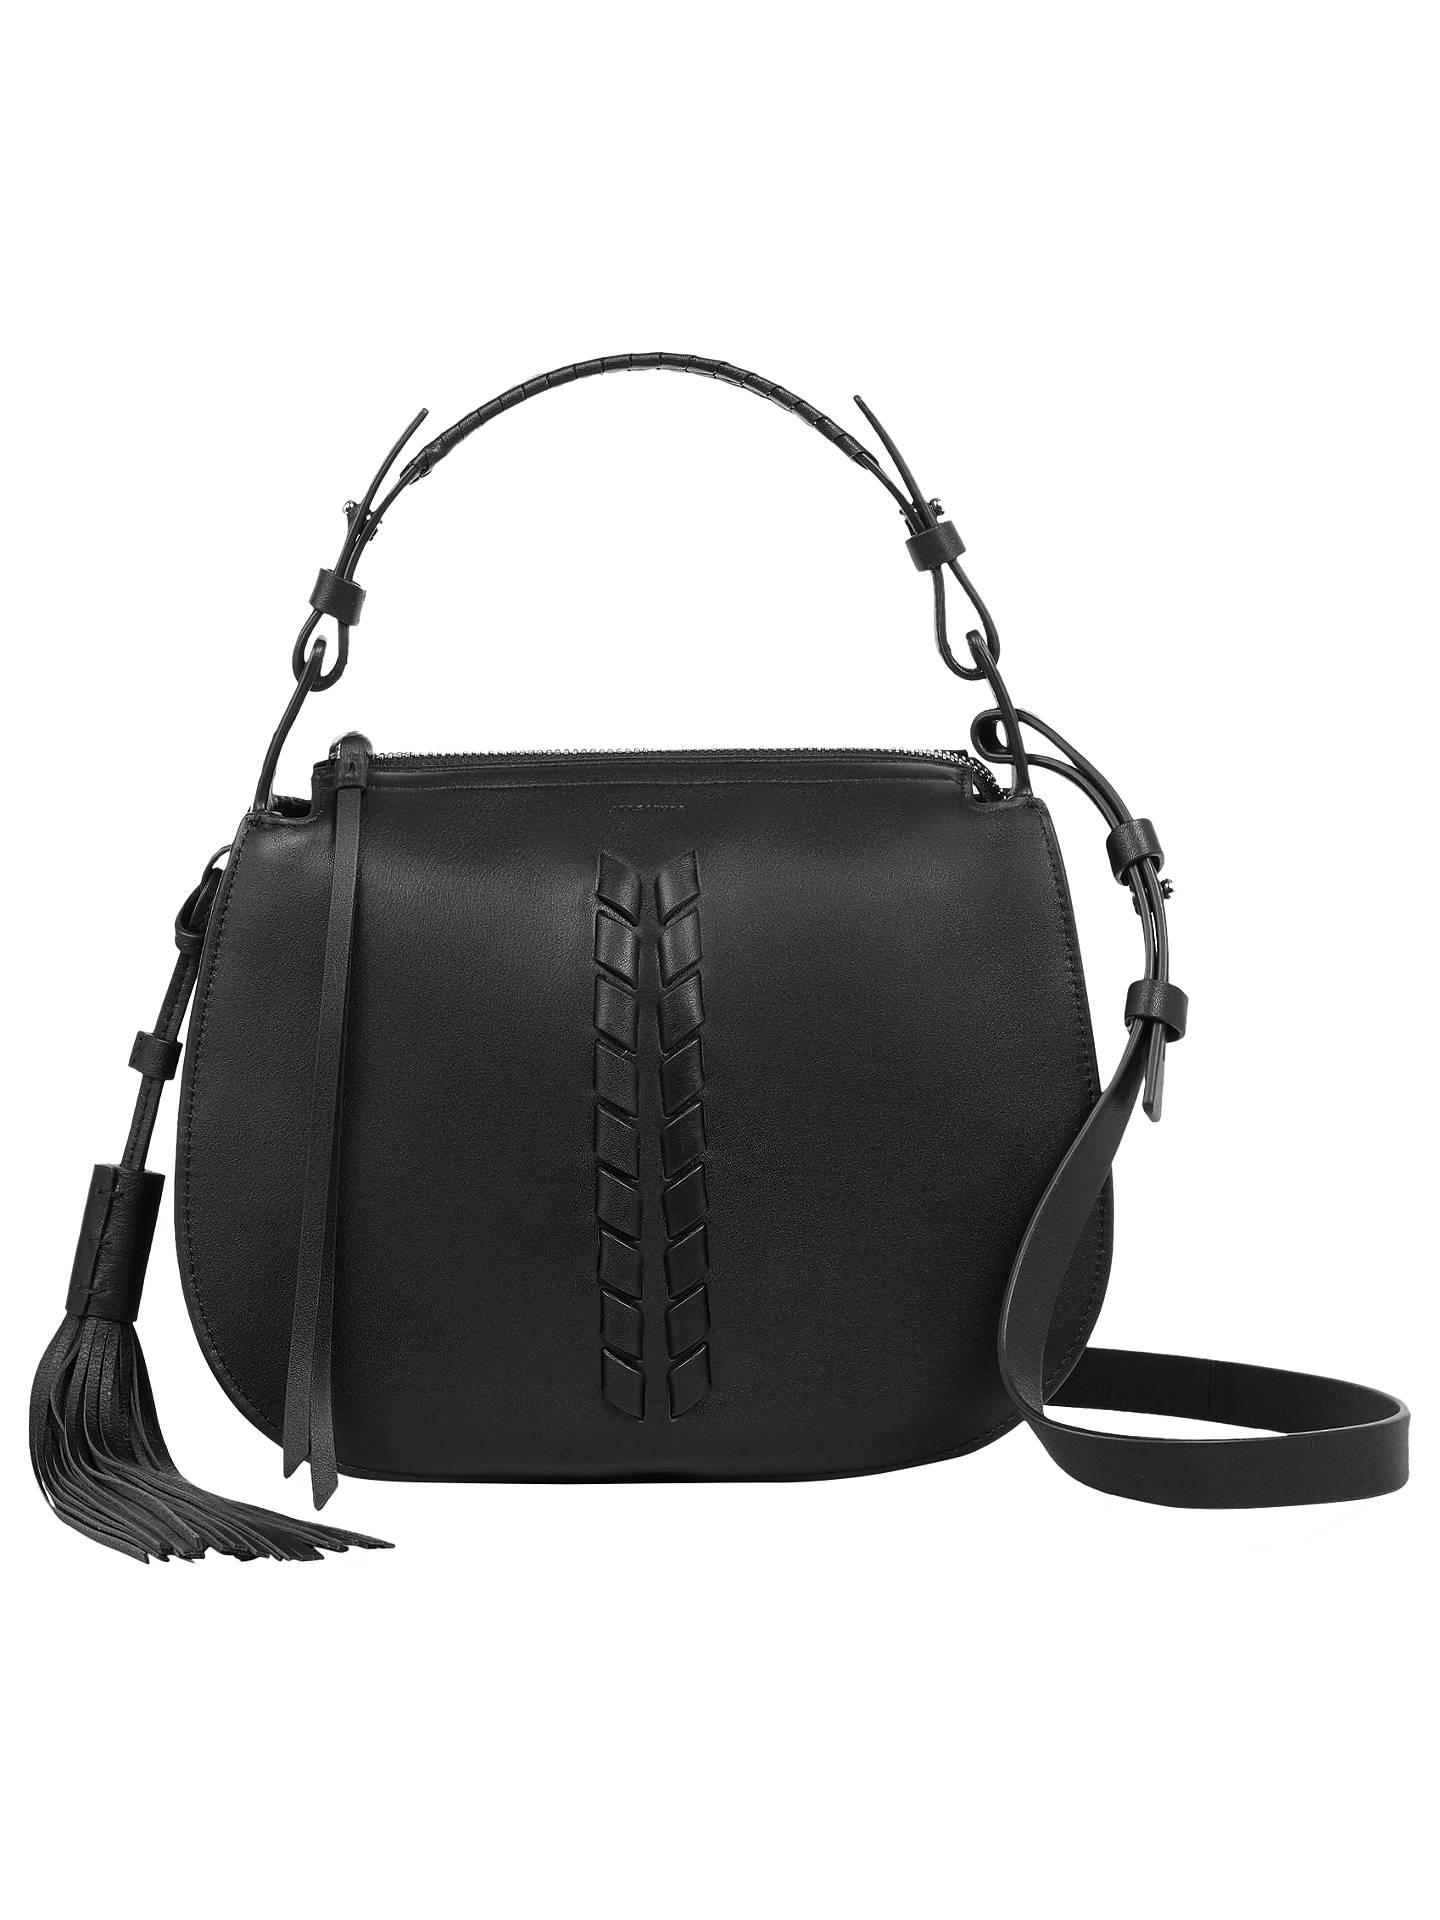 top-rated original replicas choose best AllSaints Kepi Leather Cross Body Bag, Black at John Lewis ...